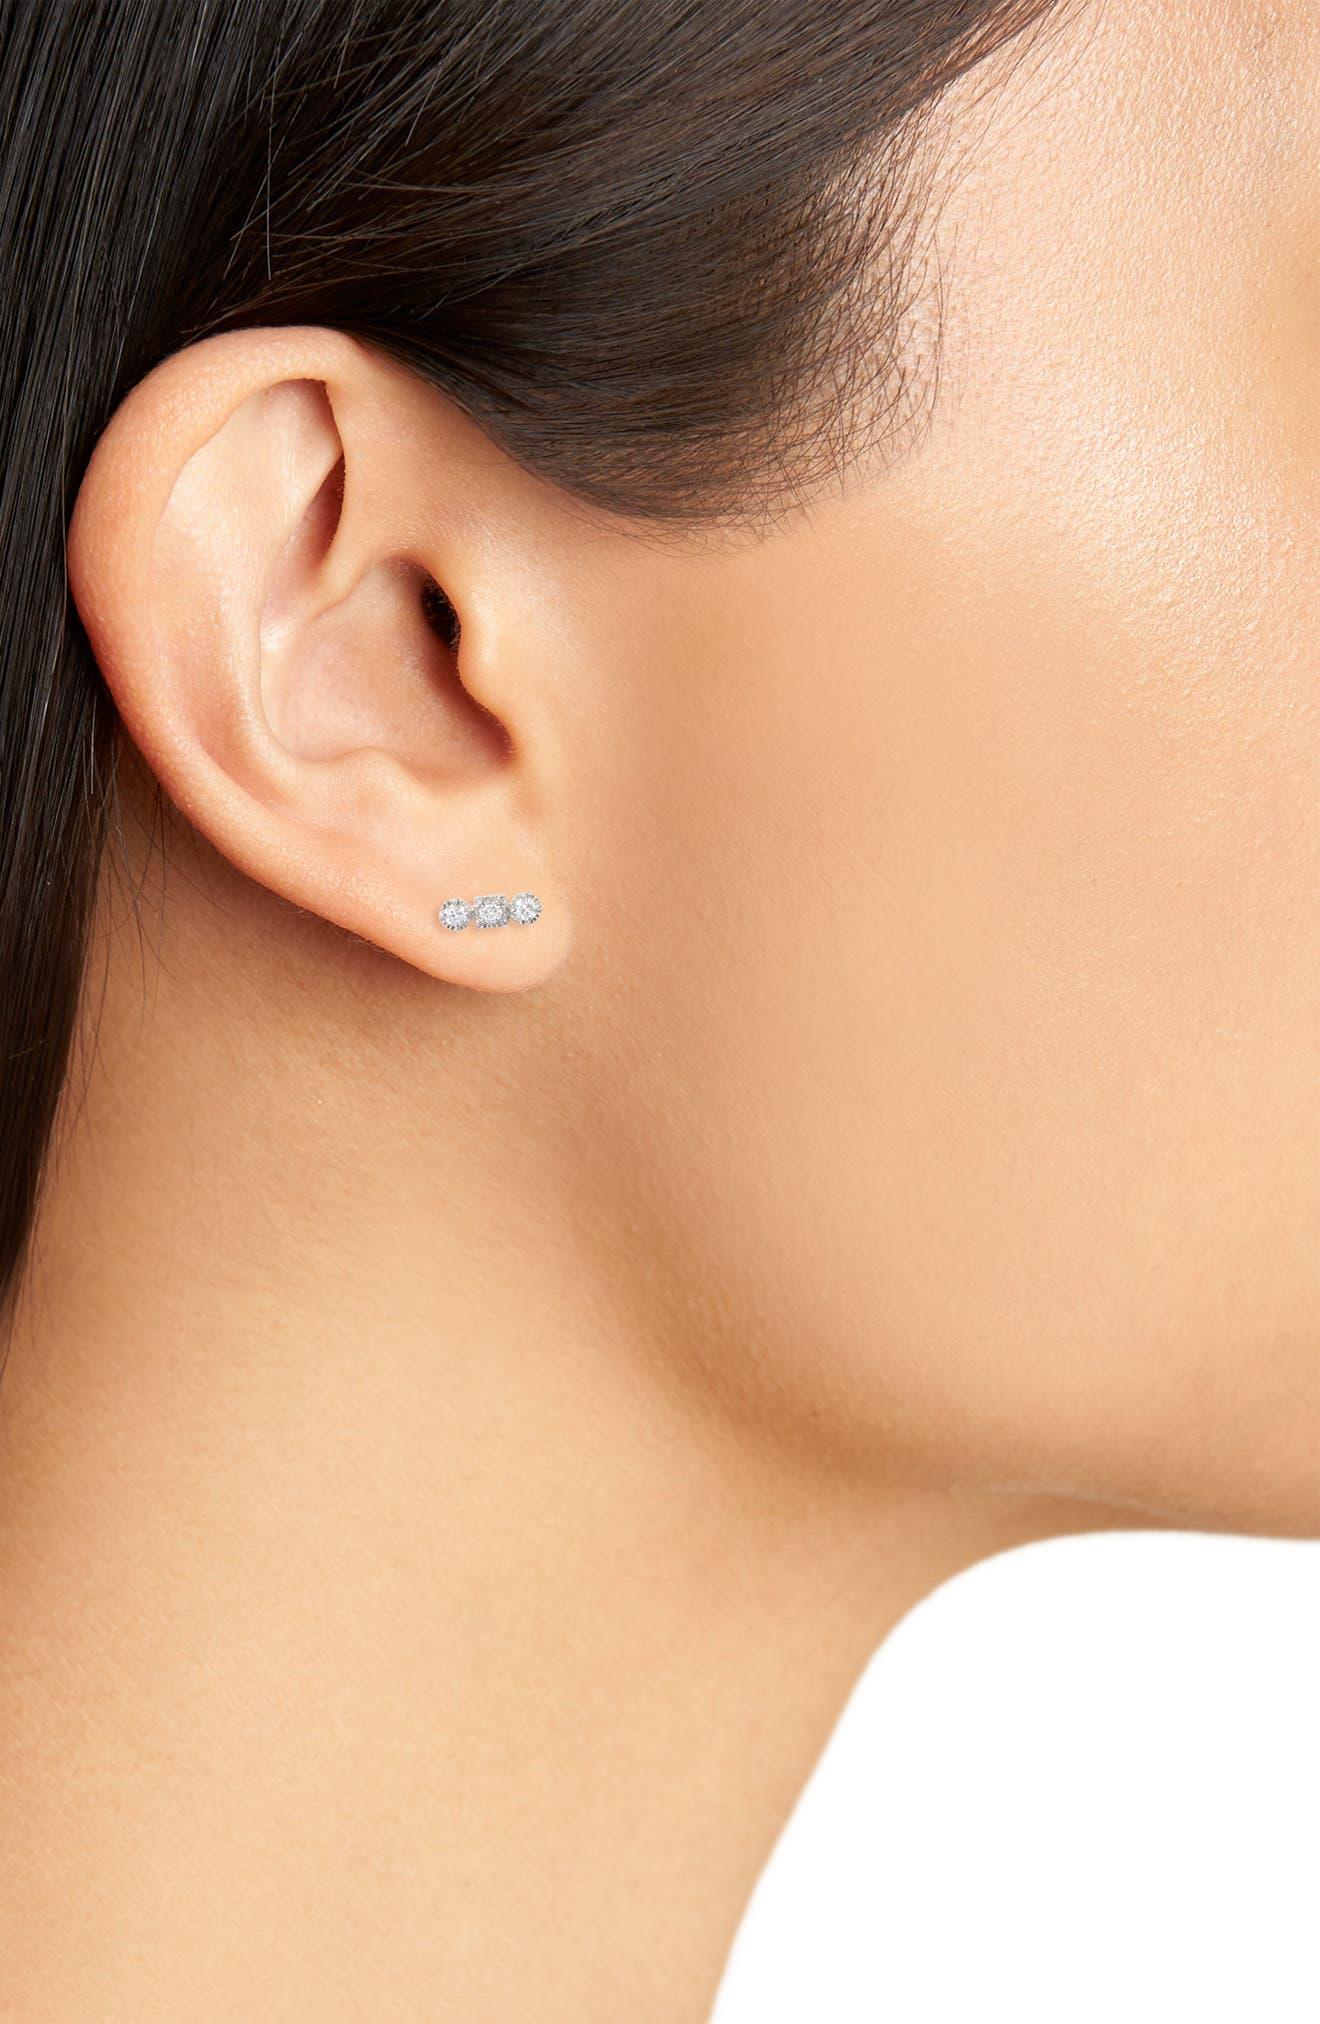 Maya 3-Stone Stud Earrings,                             Alternate thumbnail 2, color,                             WHITE GOLD/ DIAMOND